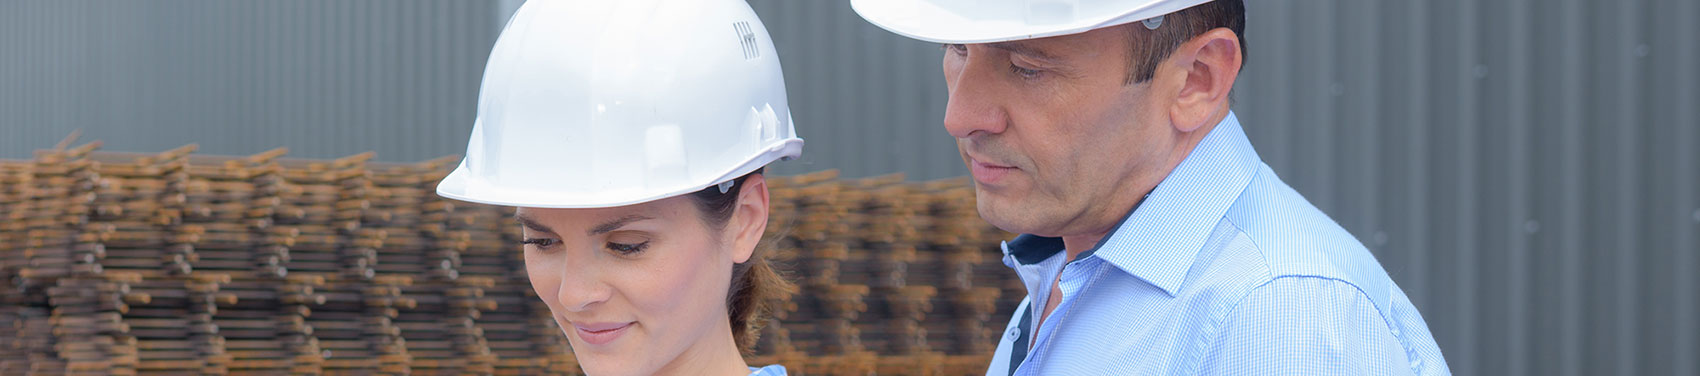 Building Material Recruiters